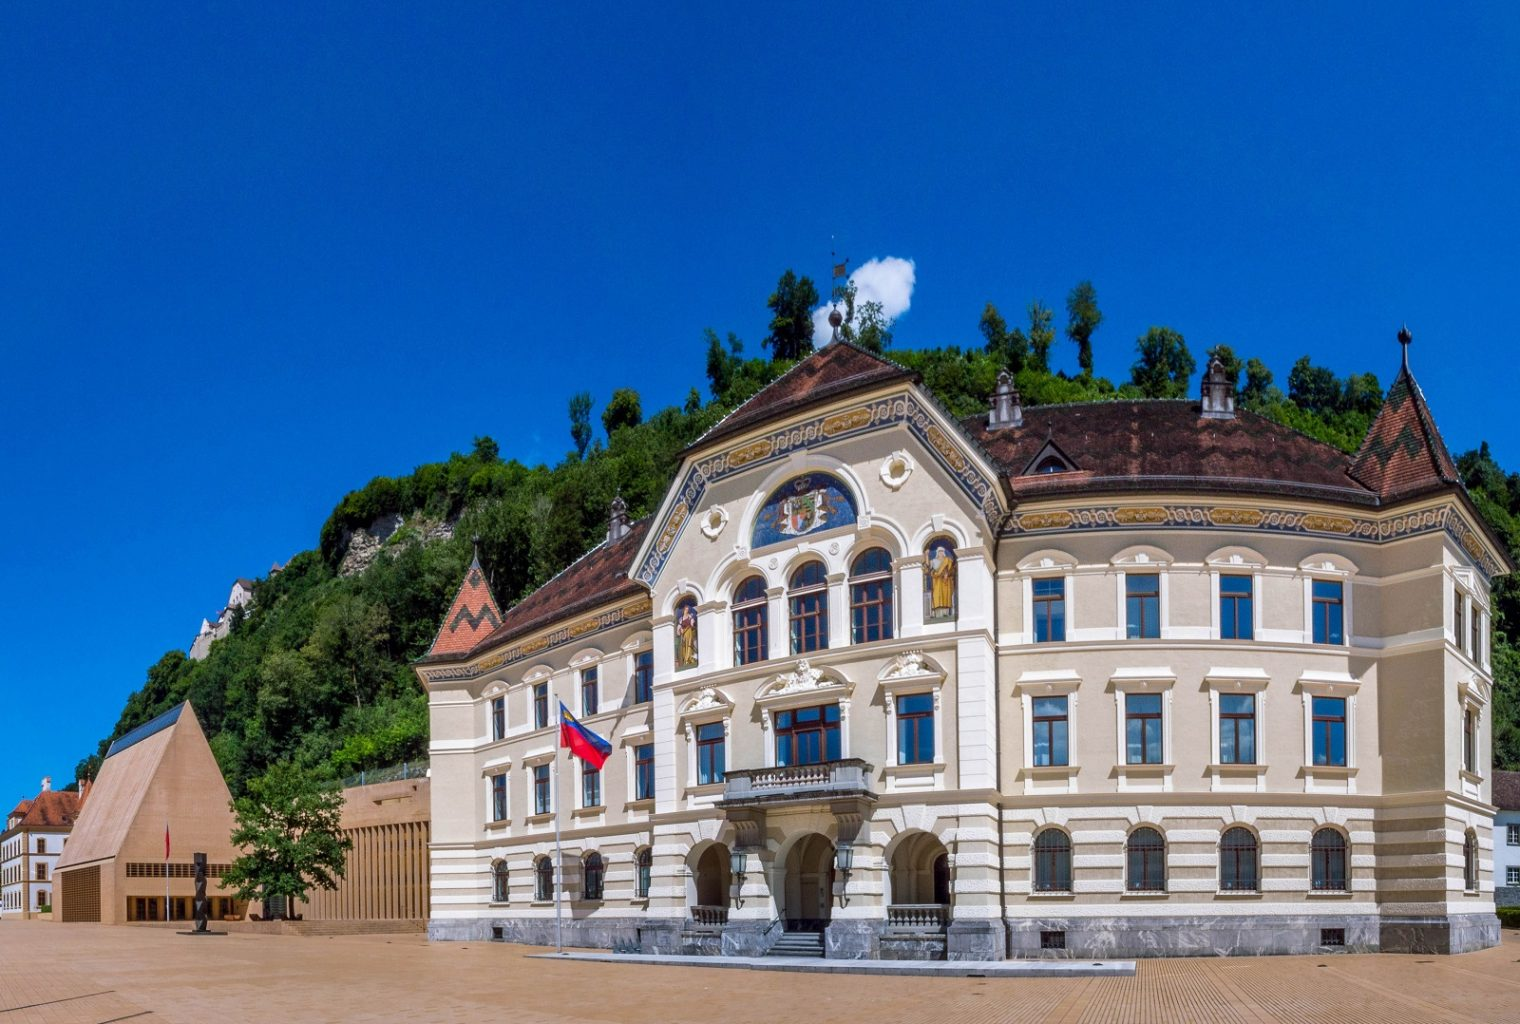 Liechtenstein adopta la Ley de tokens para atraer negocios criptográficos